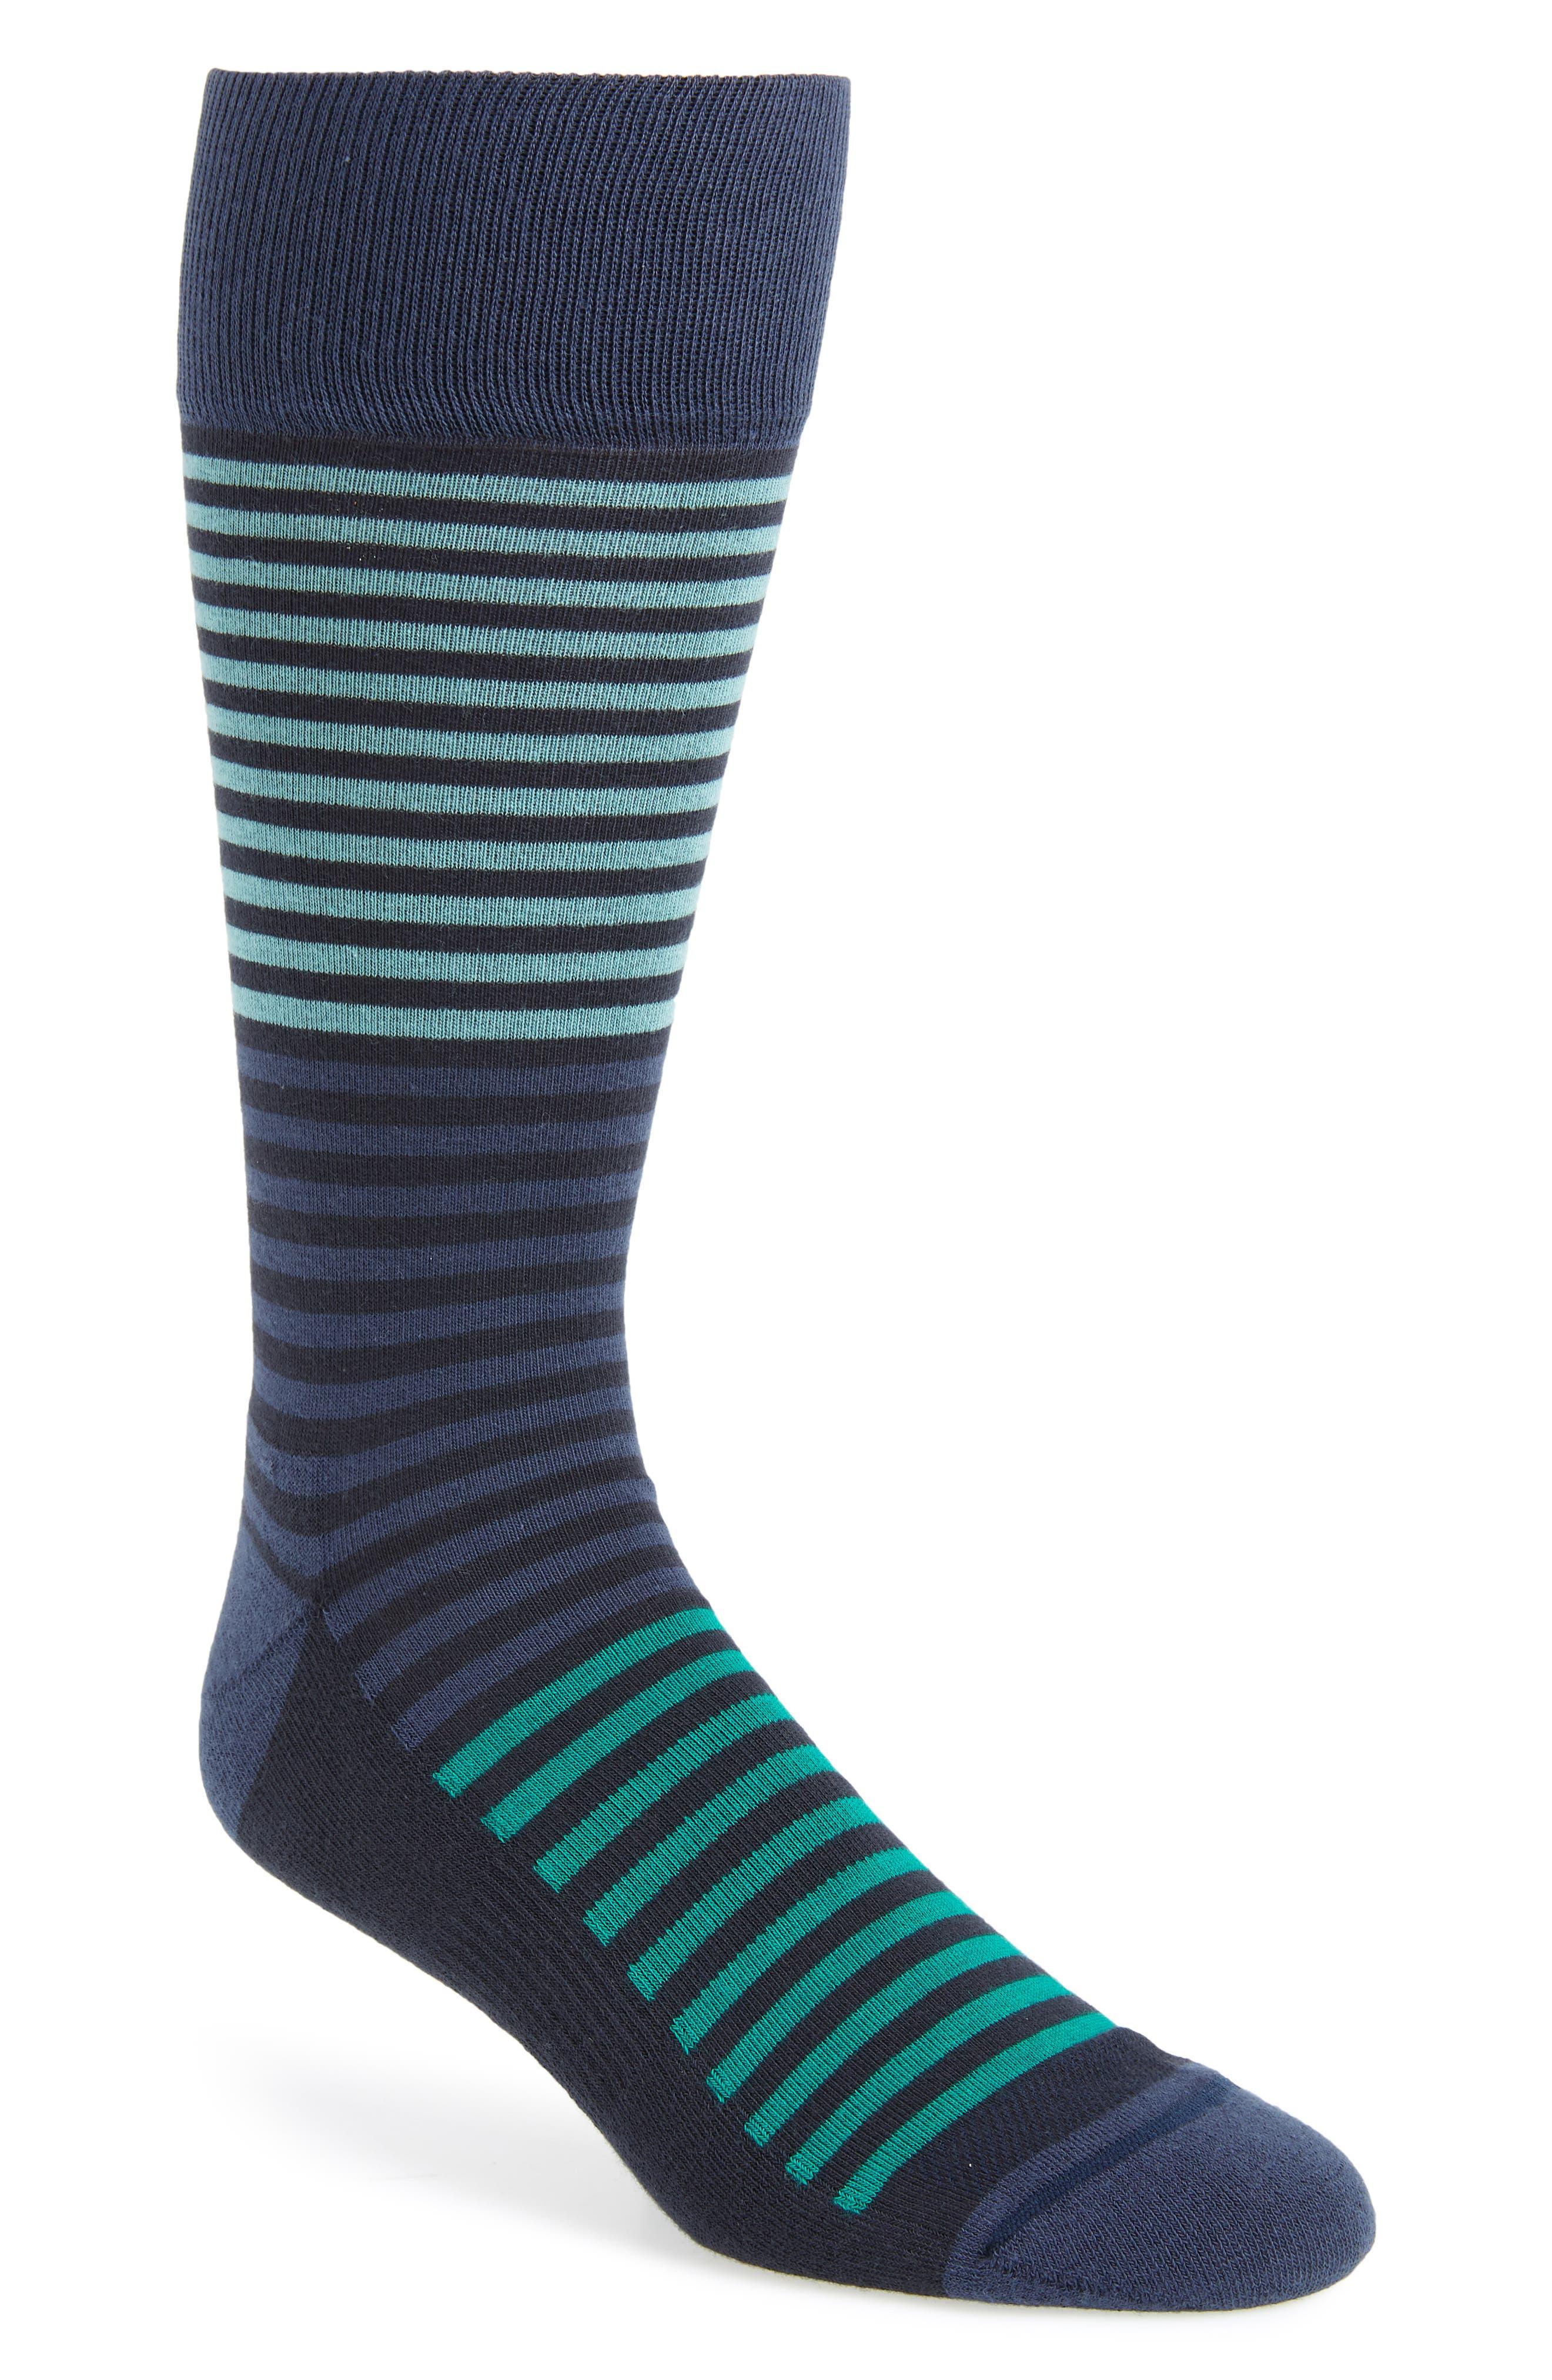 Stripe Socks,                             Main thumbnail 1, color,                             NAVY/ GREEN